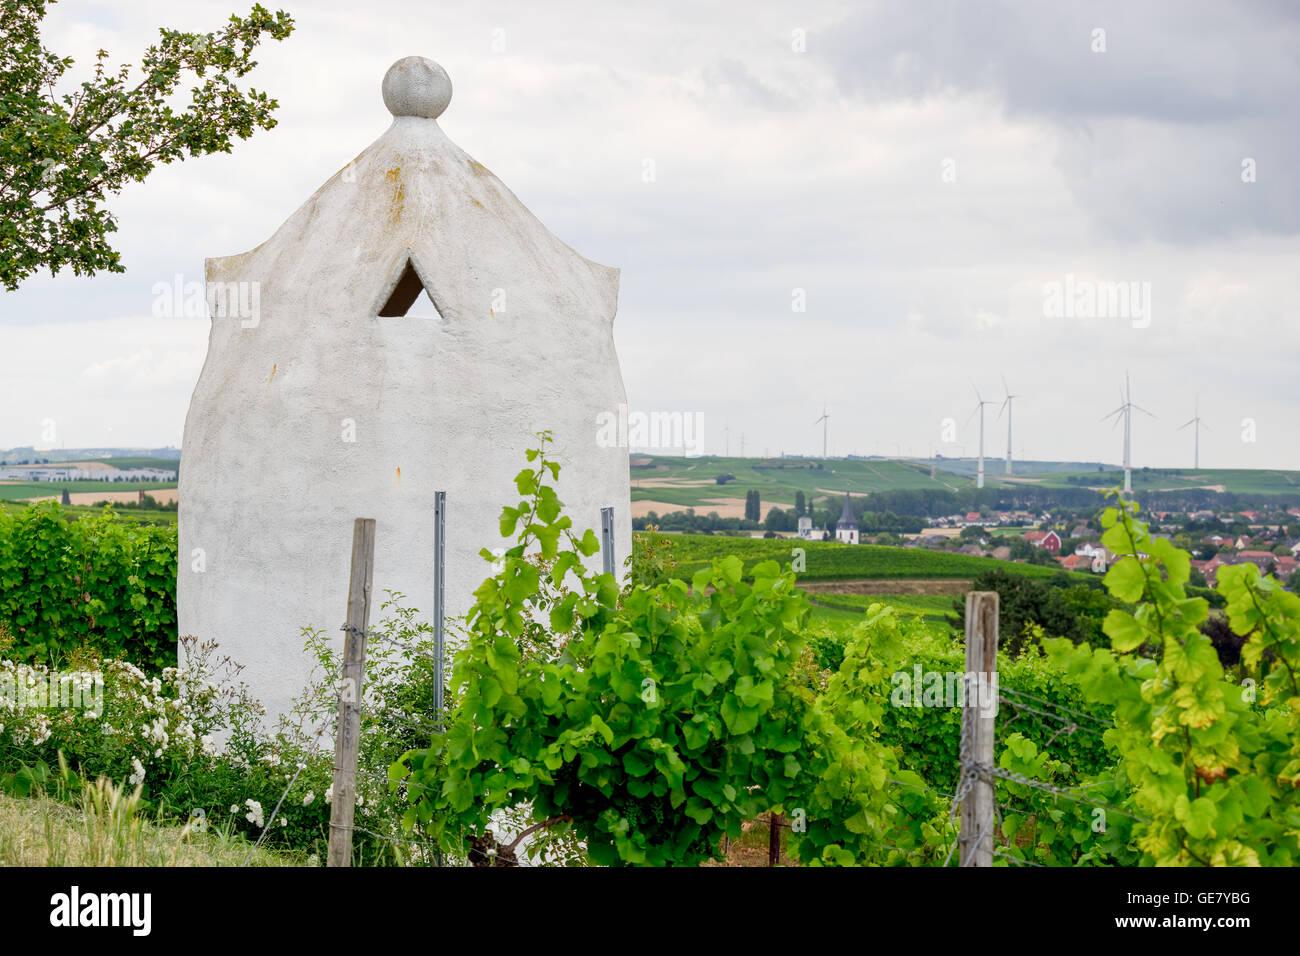 Vineyard shelter in the style of an Italian Trullo in Rheinhessen, Germany, Rhine-Hesse. - Stock Image